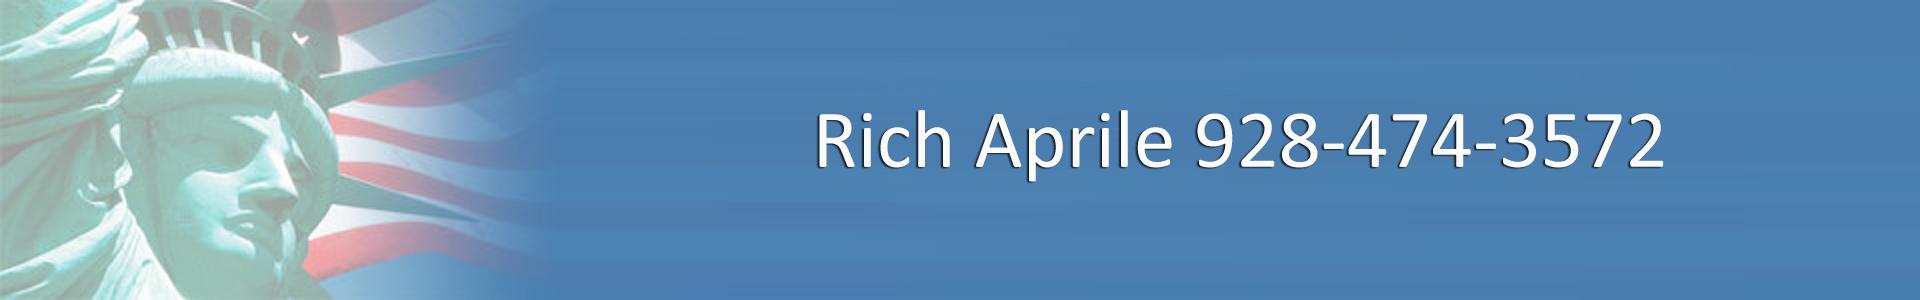 Rich Aprile, Advisor | Medicare Solutions AZ | 928-474-3572